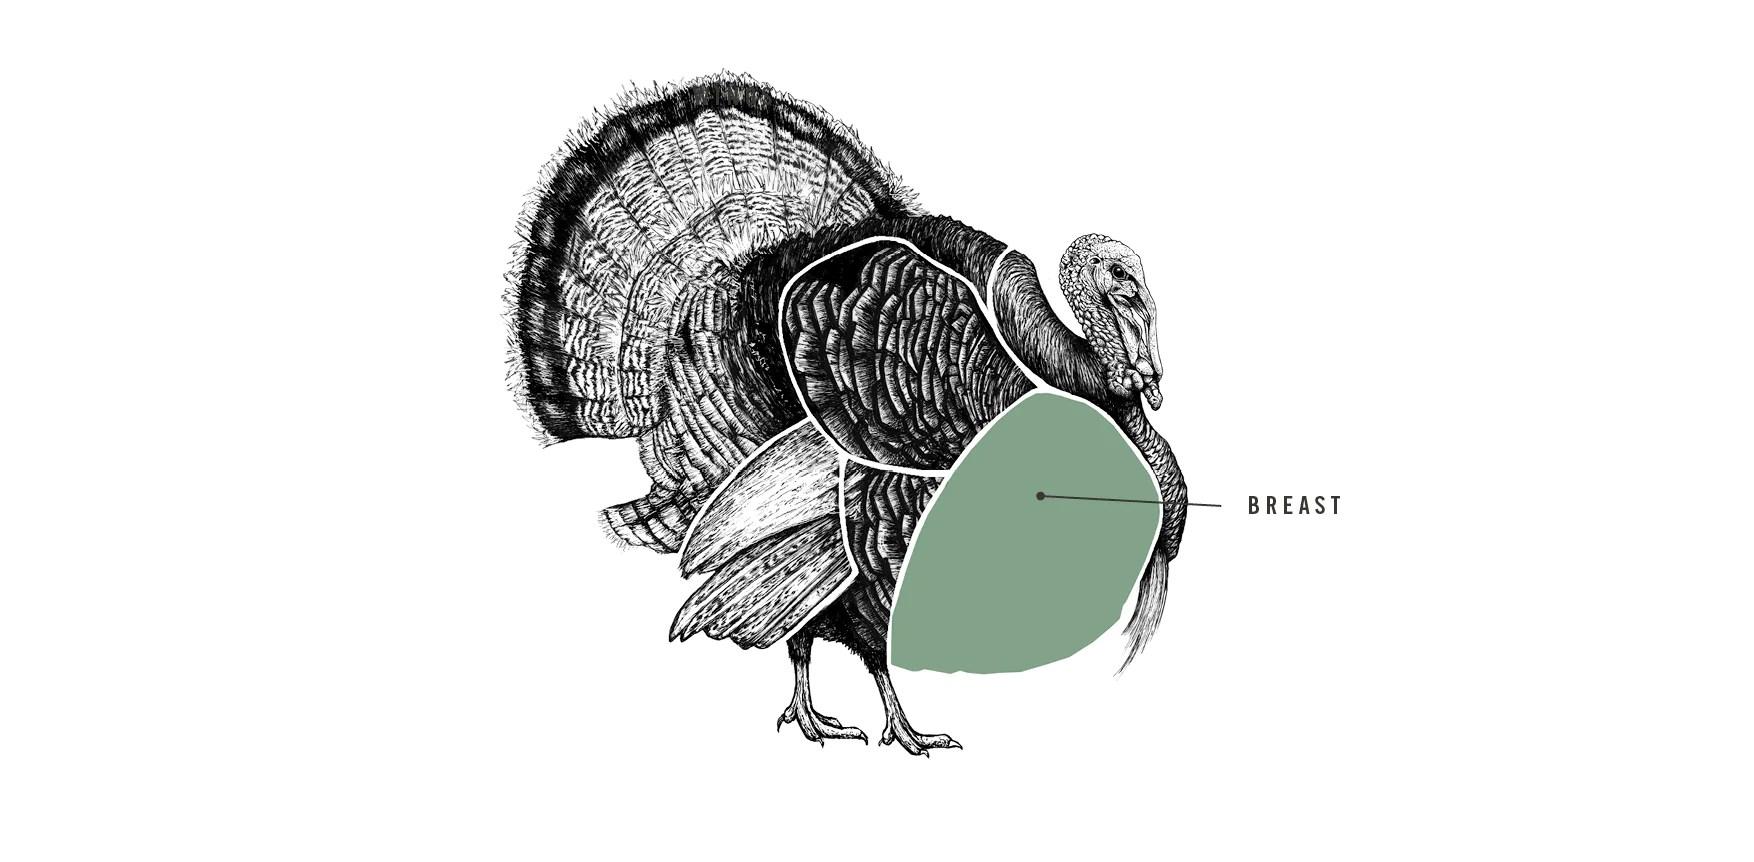 medium resolution of free range bronze turkey breast meat cuts diagram